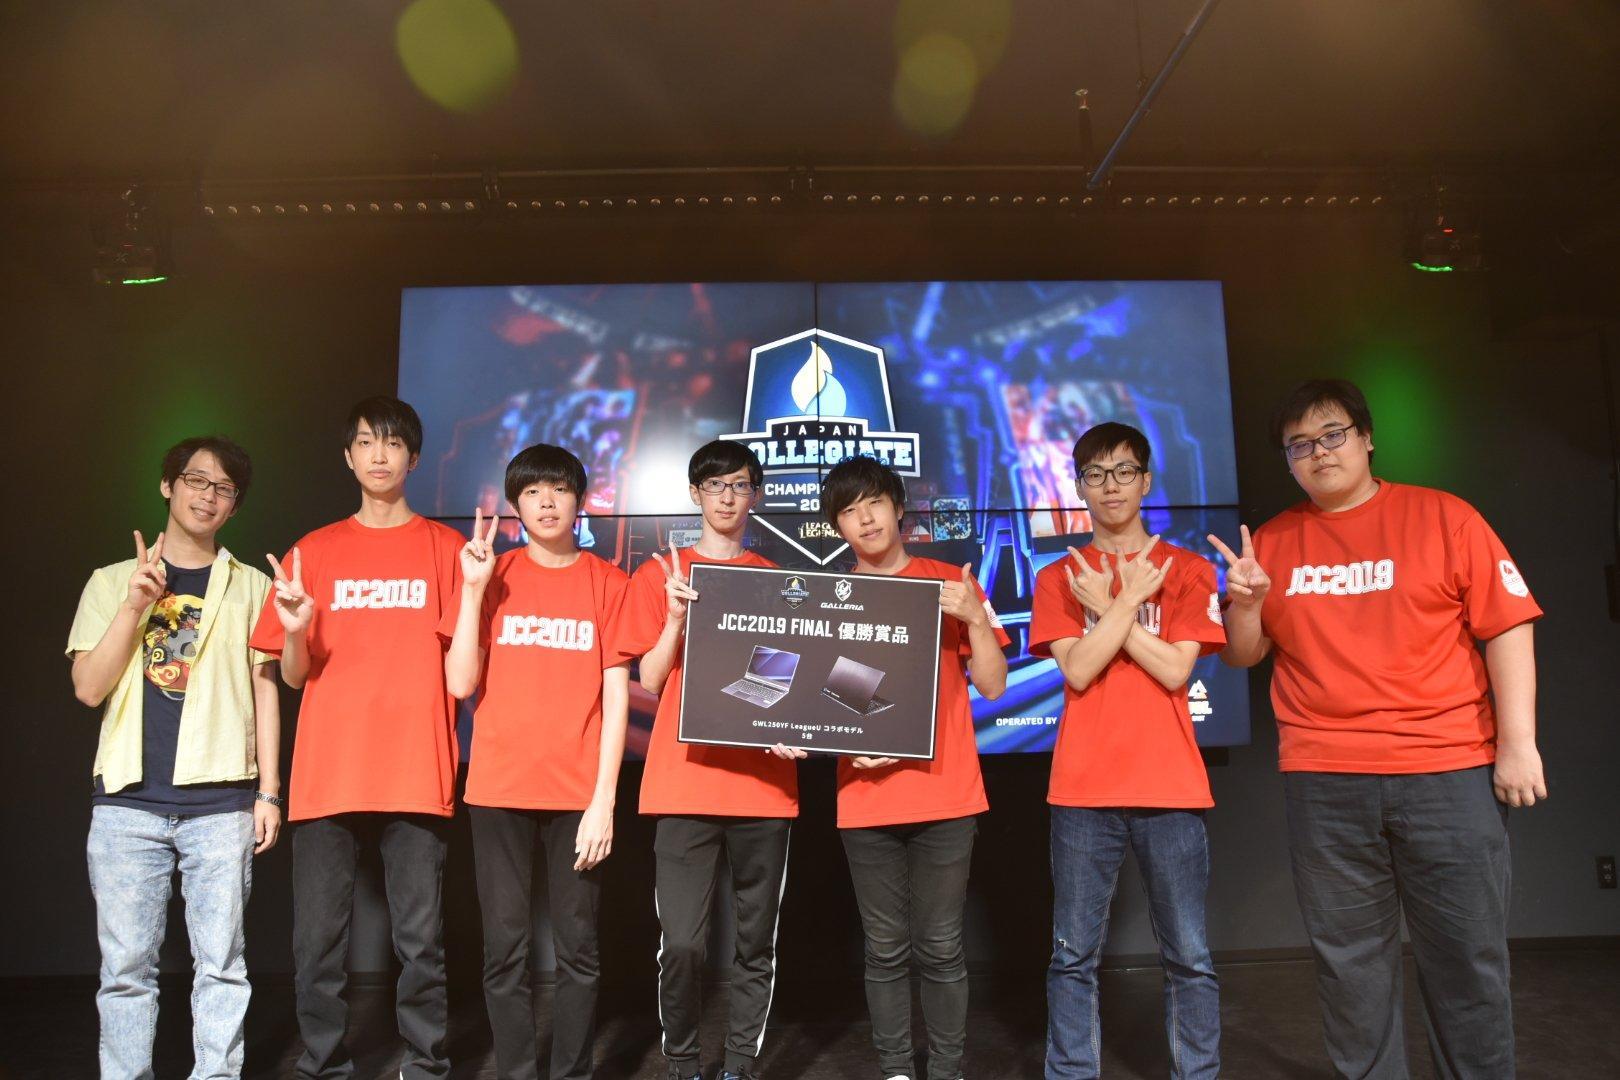 eスポーツサークルが日本代表として2年連続世界大会に出場します -- 東京工科大学